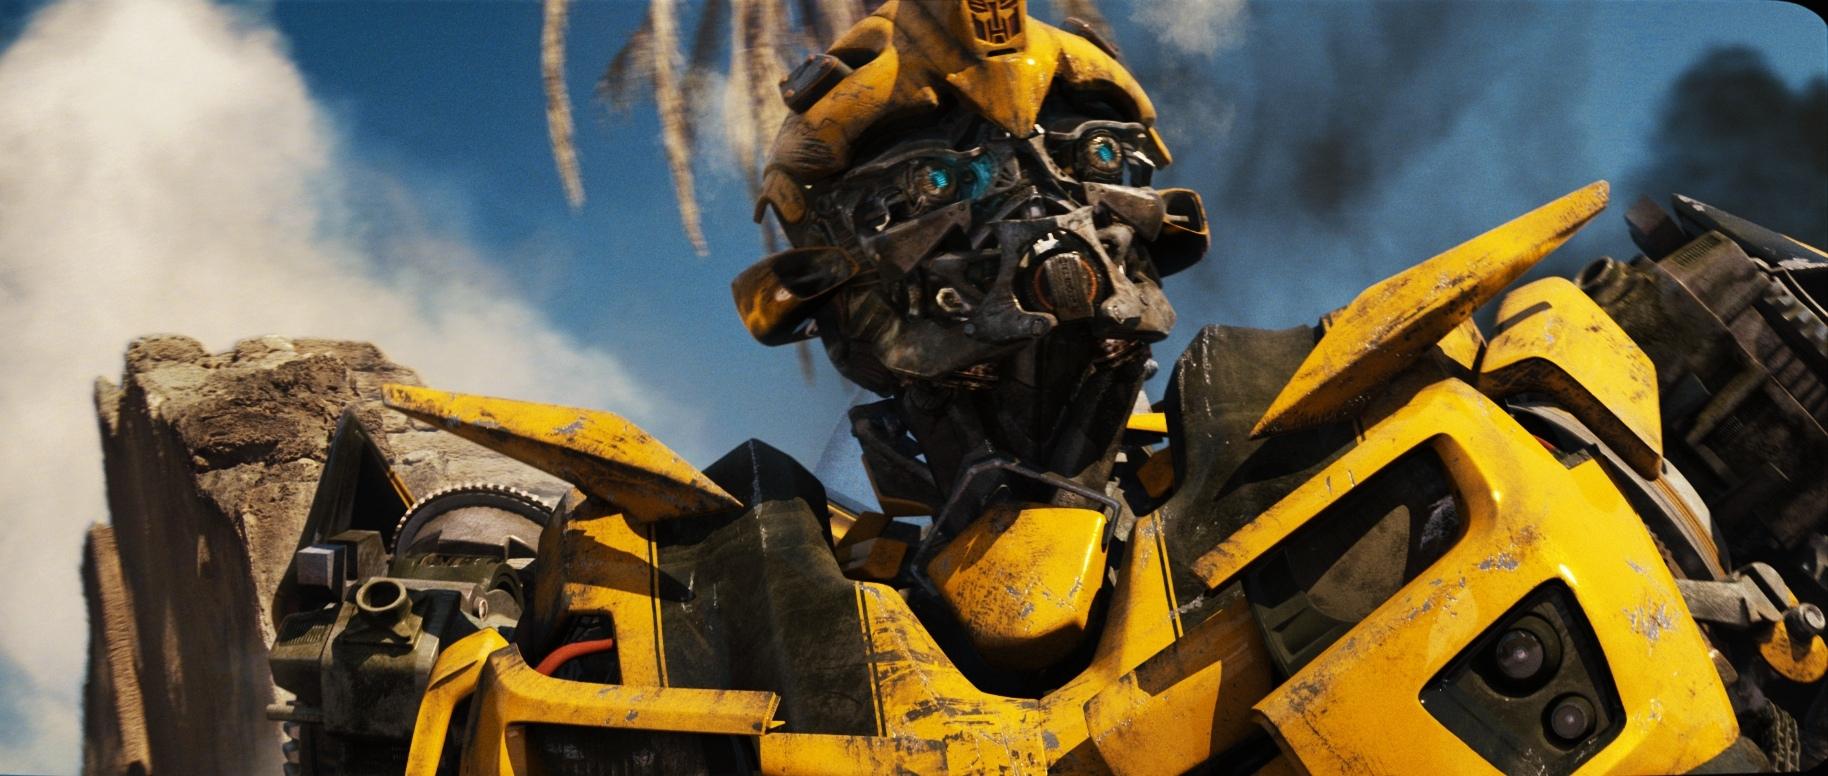 Transformers: Revenge of the Fallen — Bumblebee